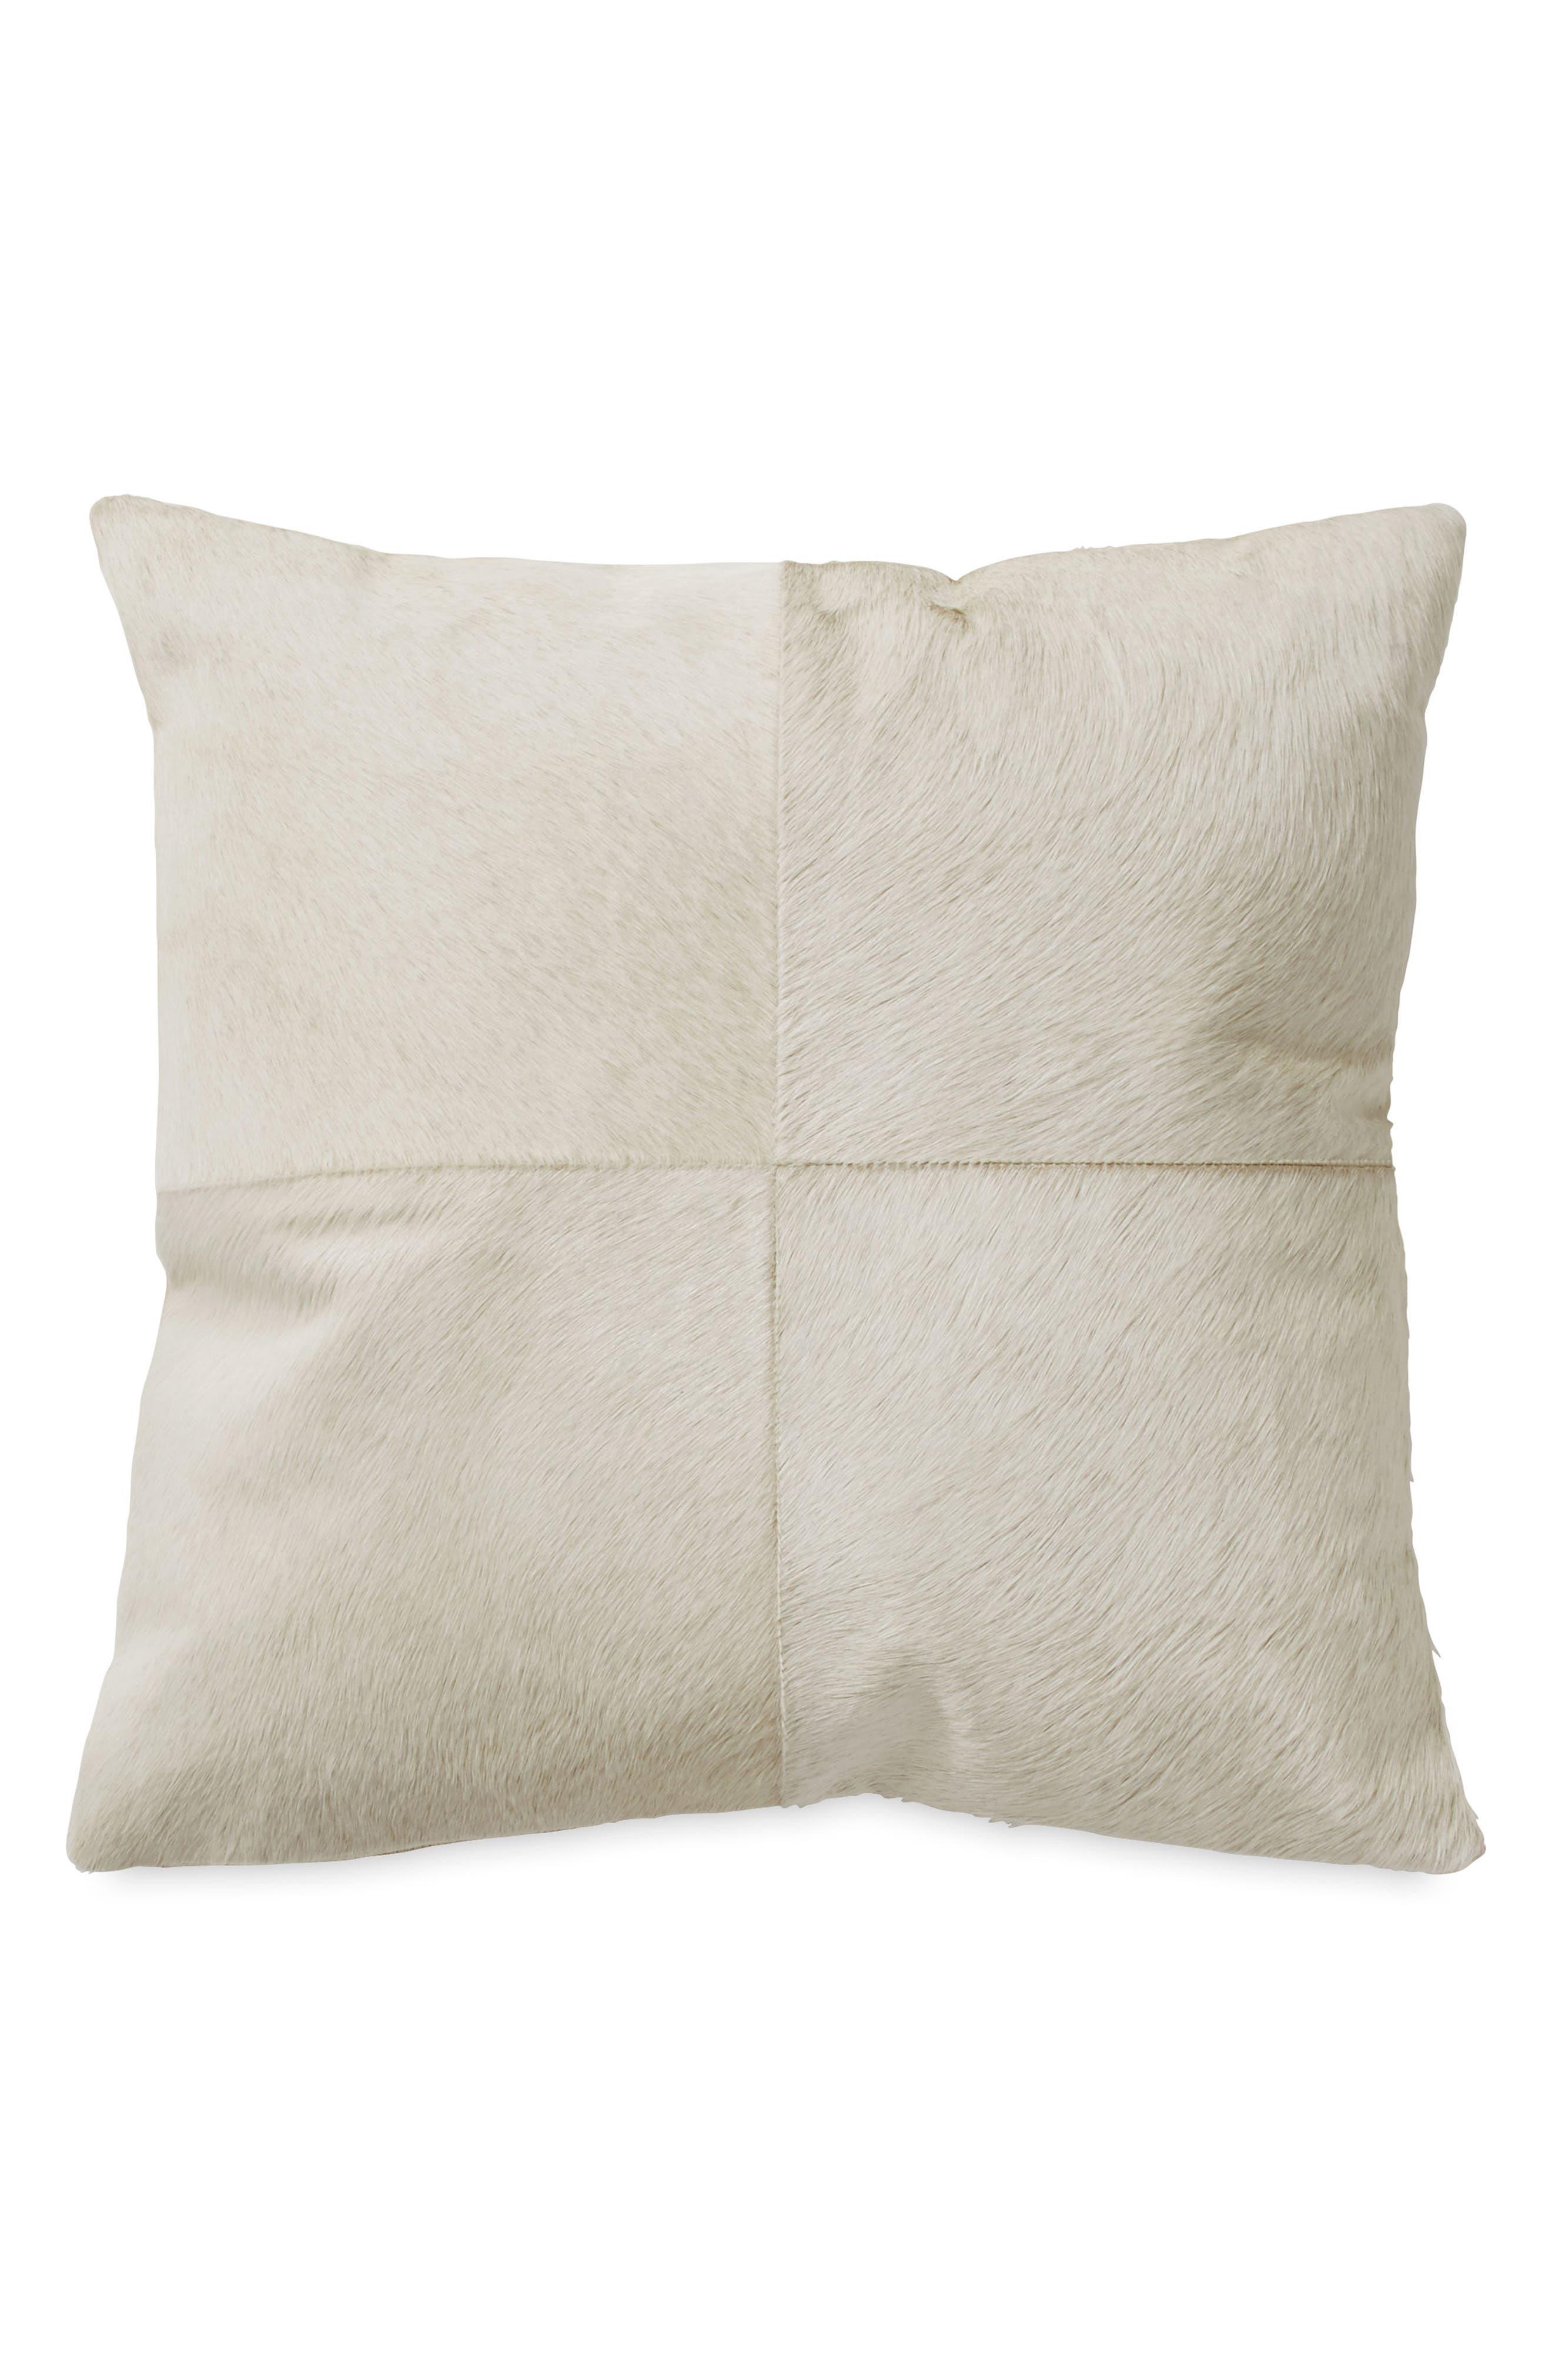 Alternate Image 1 Selected - Donna Karan New York Exhale Genuine Calf Hair Pillow